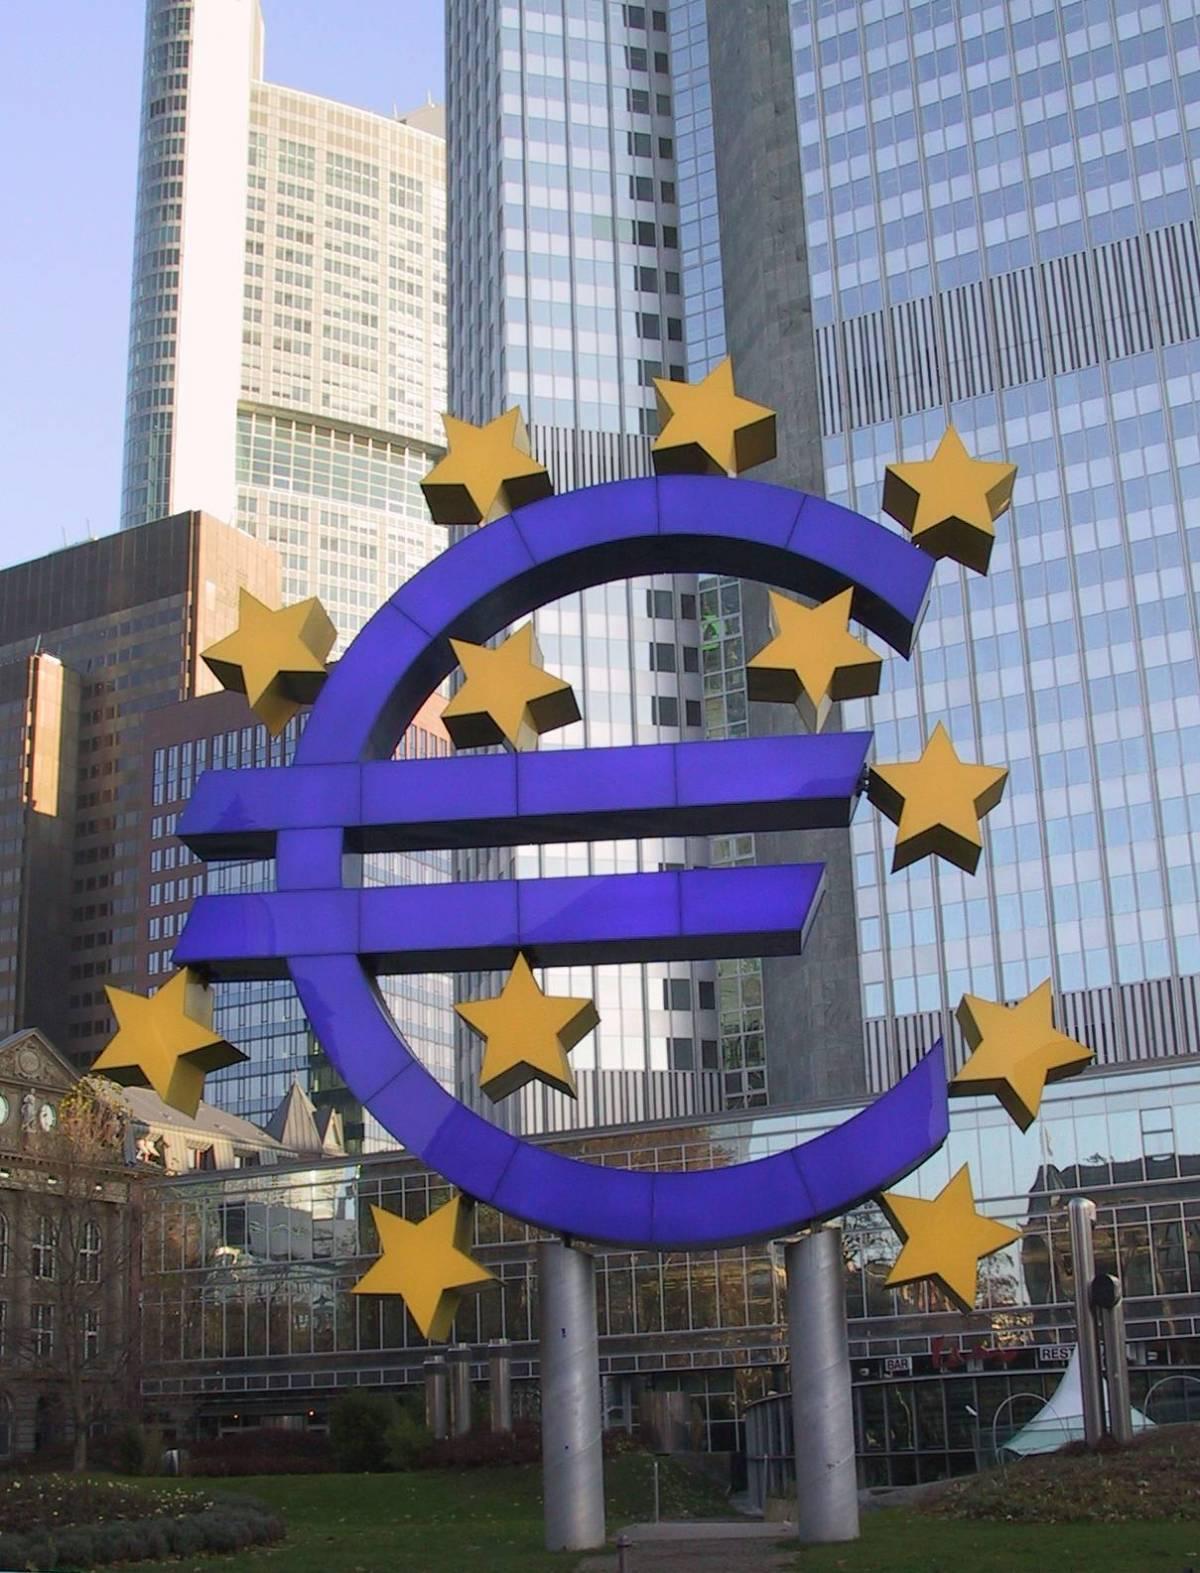 La Bce lascia invariati i tassi al 4%